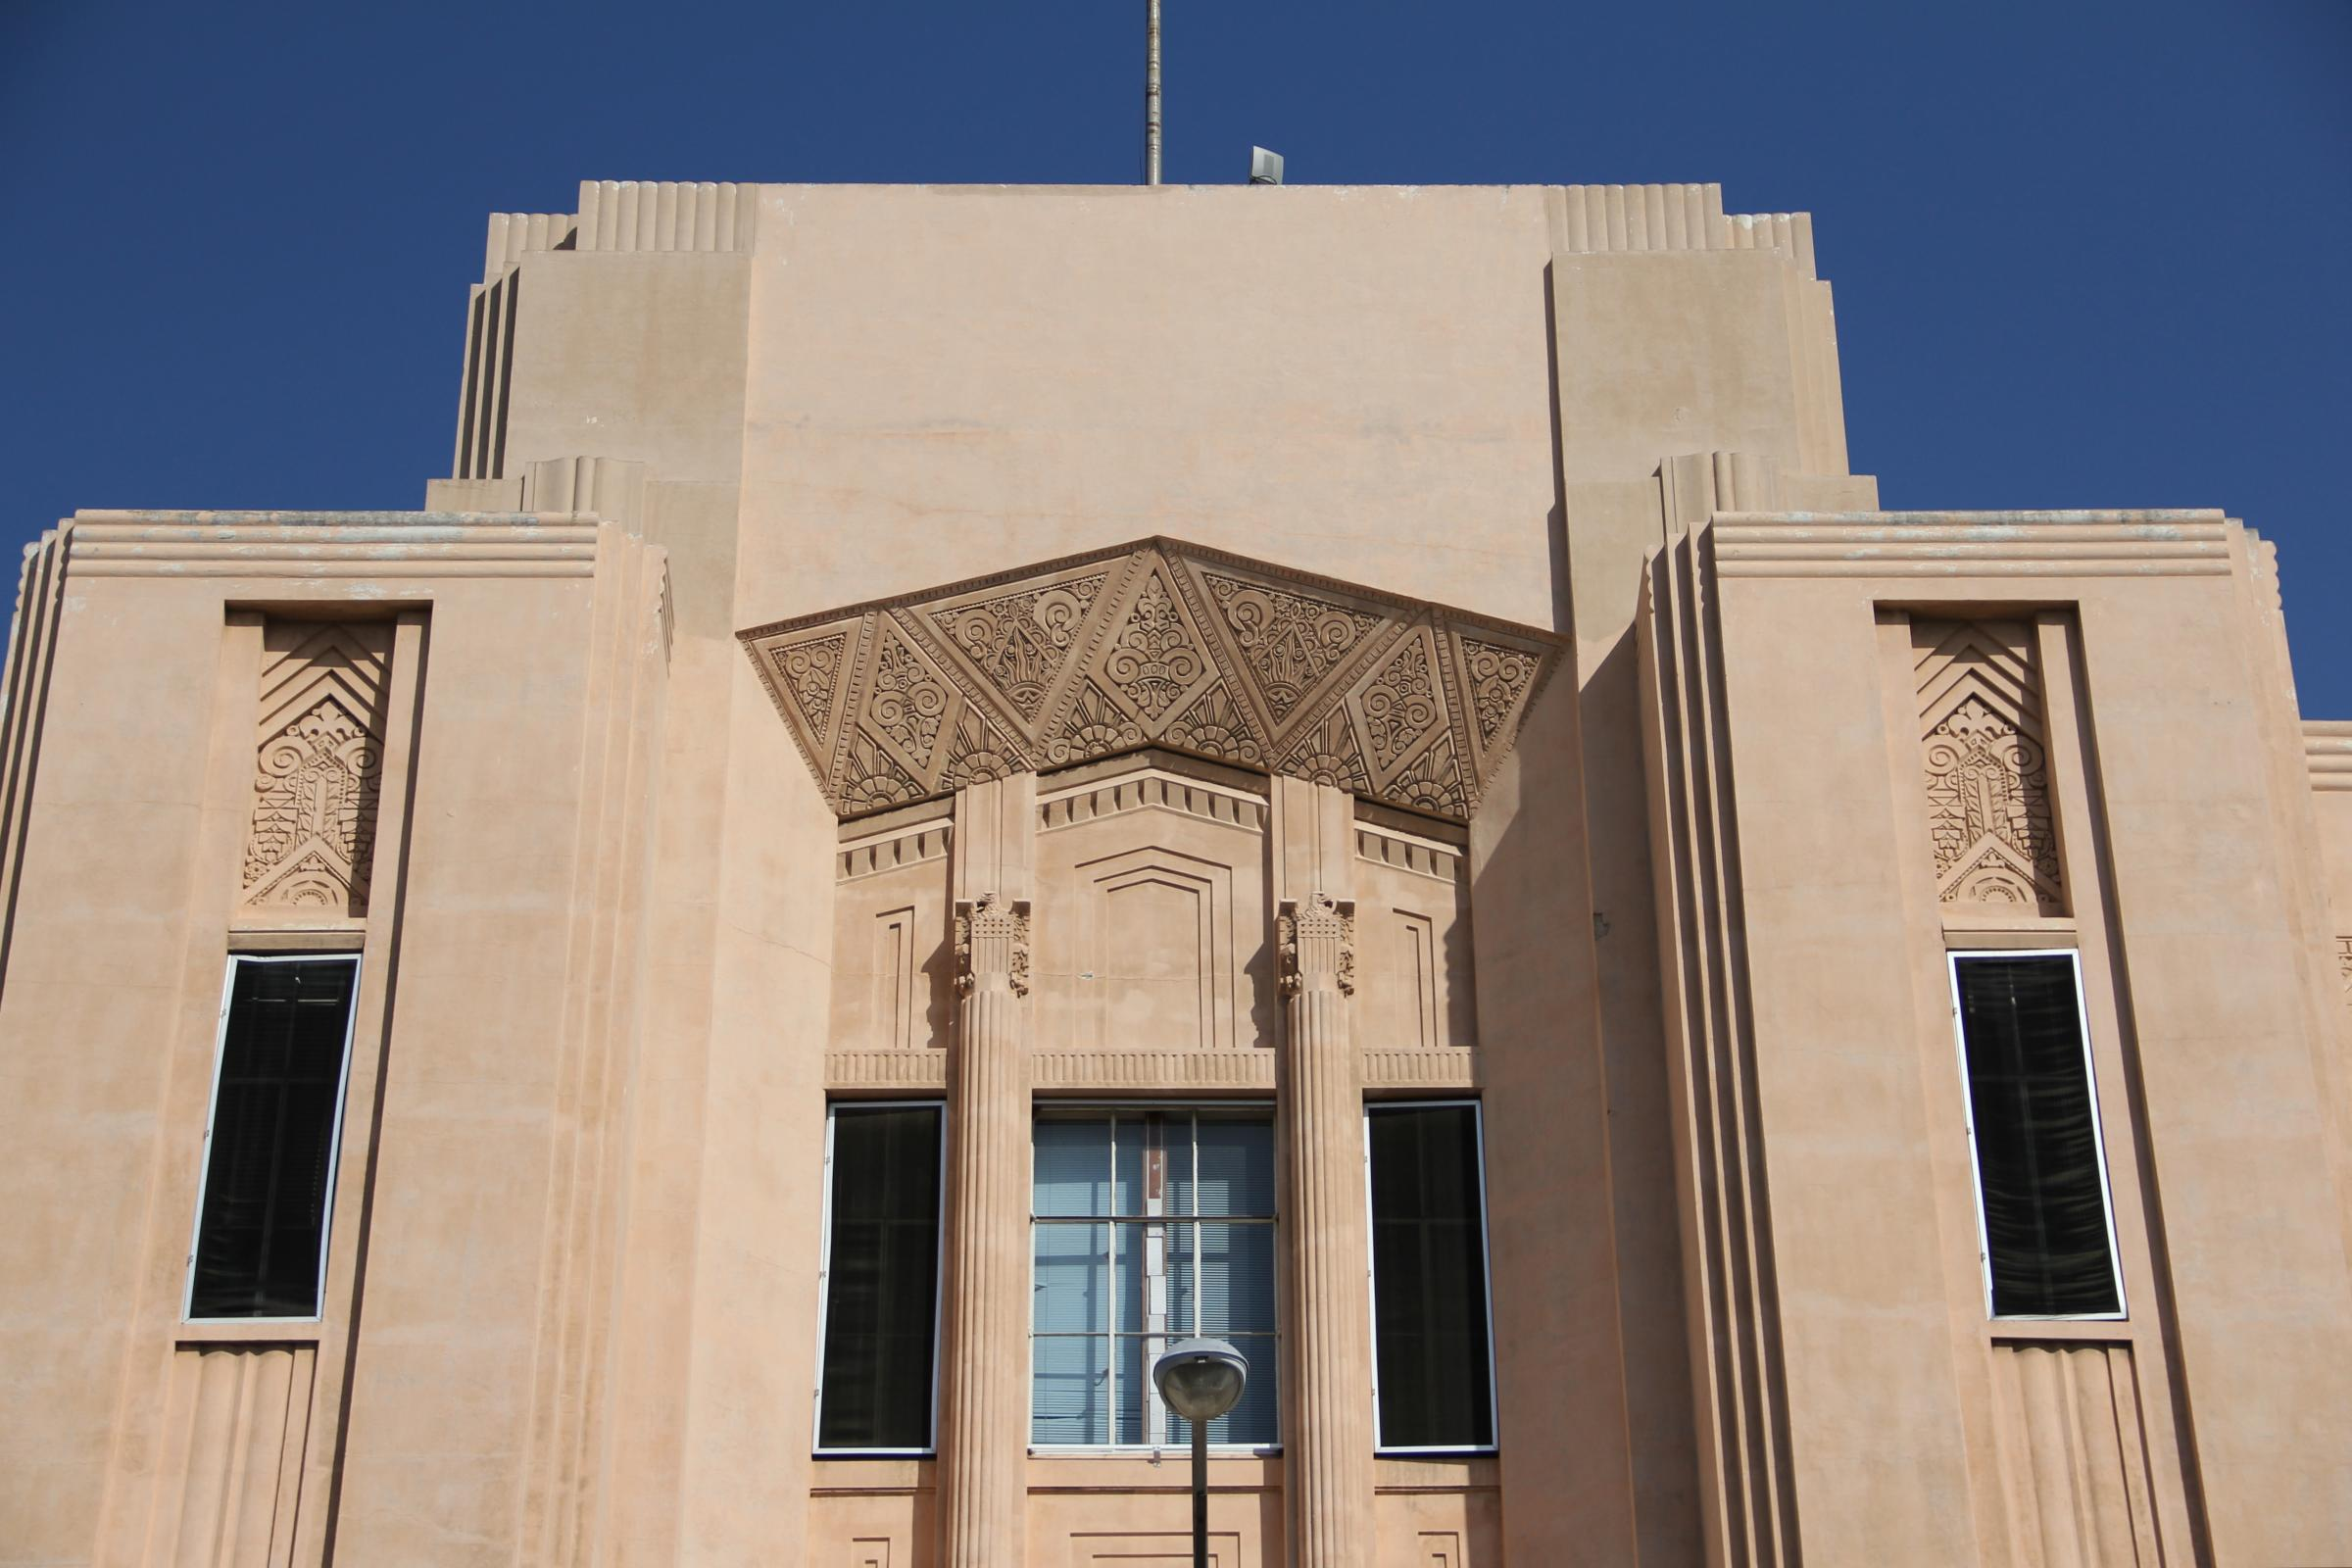 Photos art deco architecture in the san joaquin valley for Architecture art deco